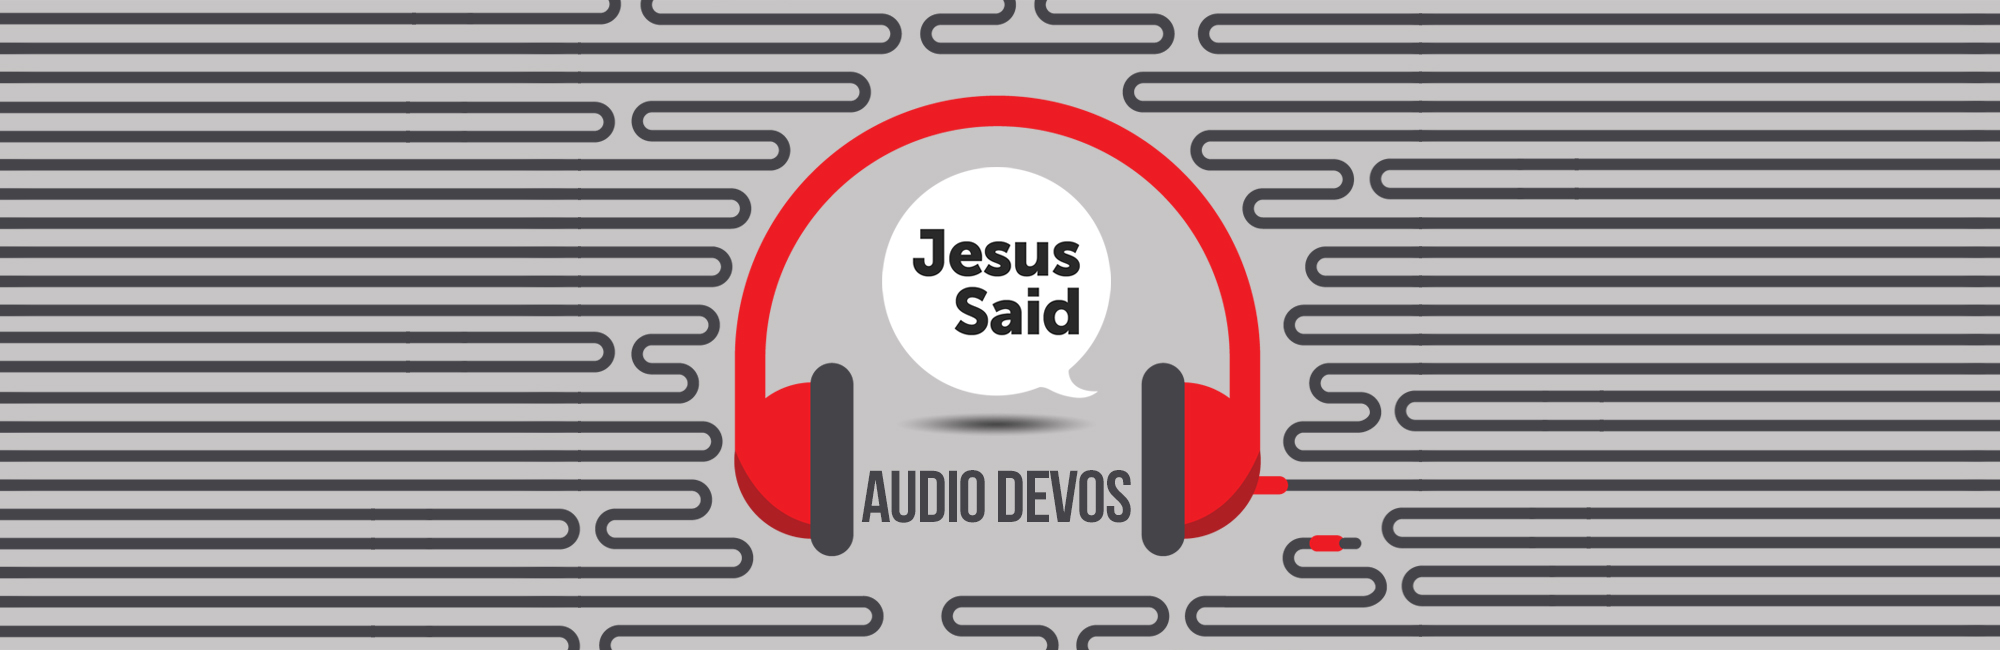 Jesus Said - Audio Devos - Messages Header